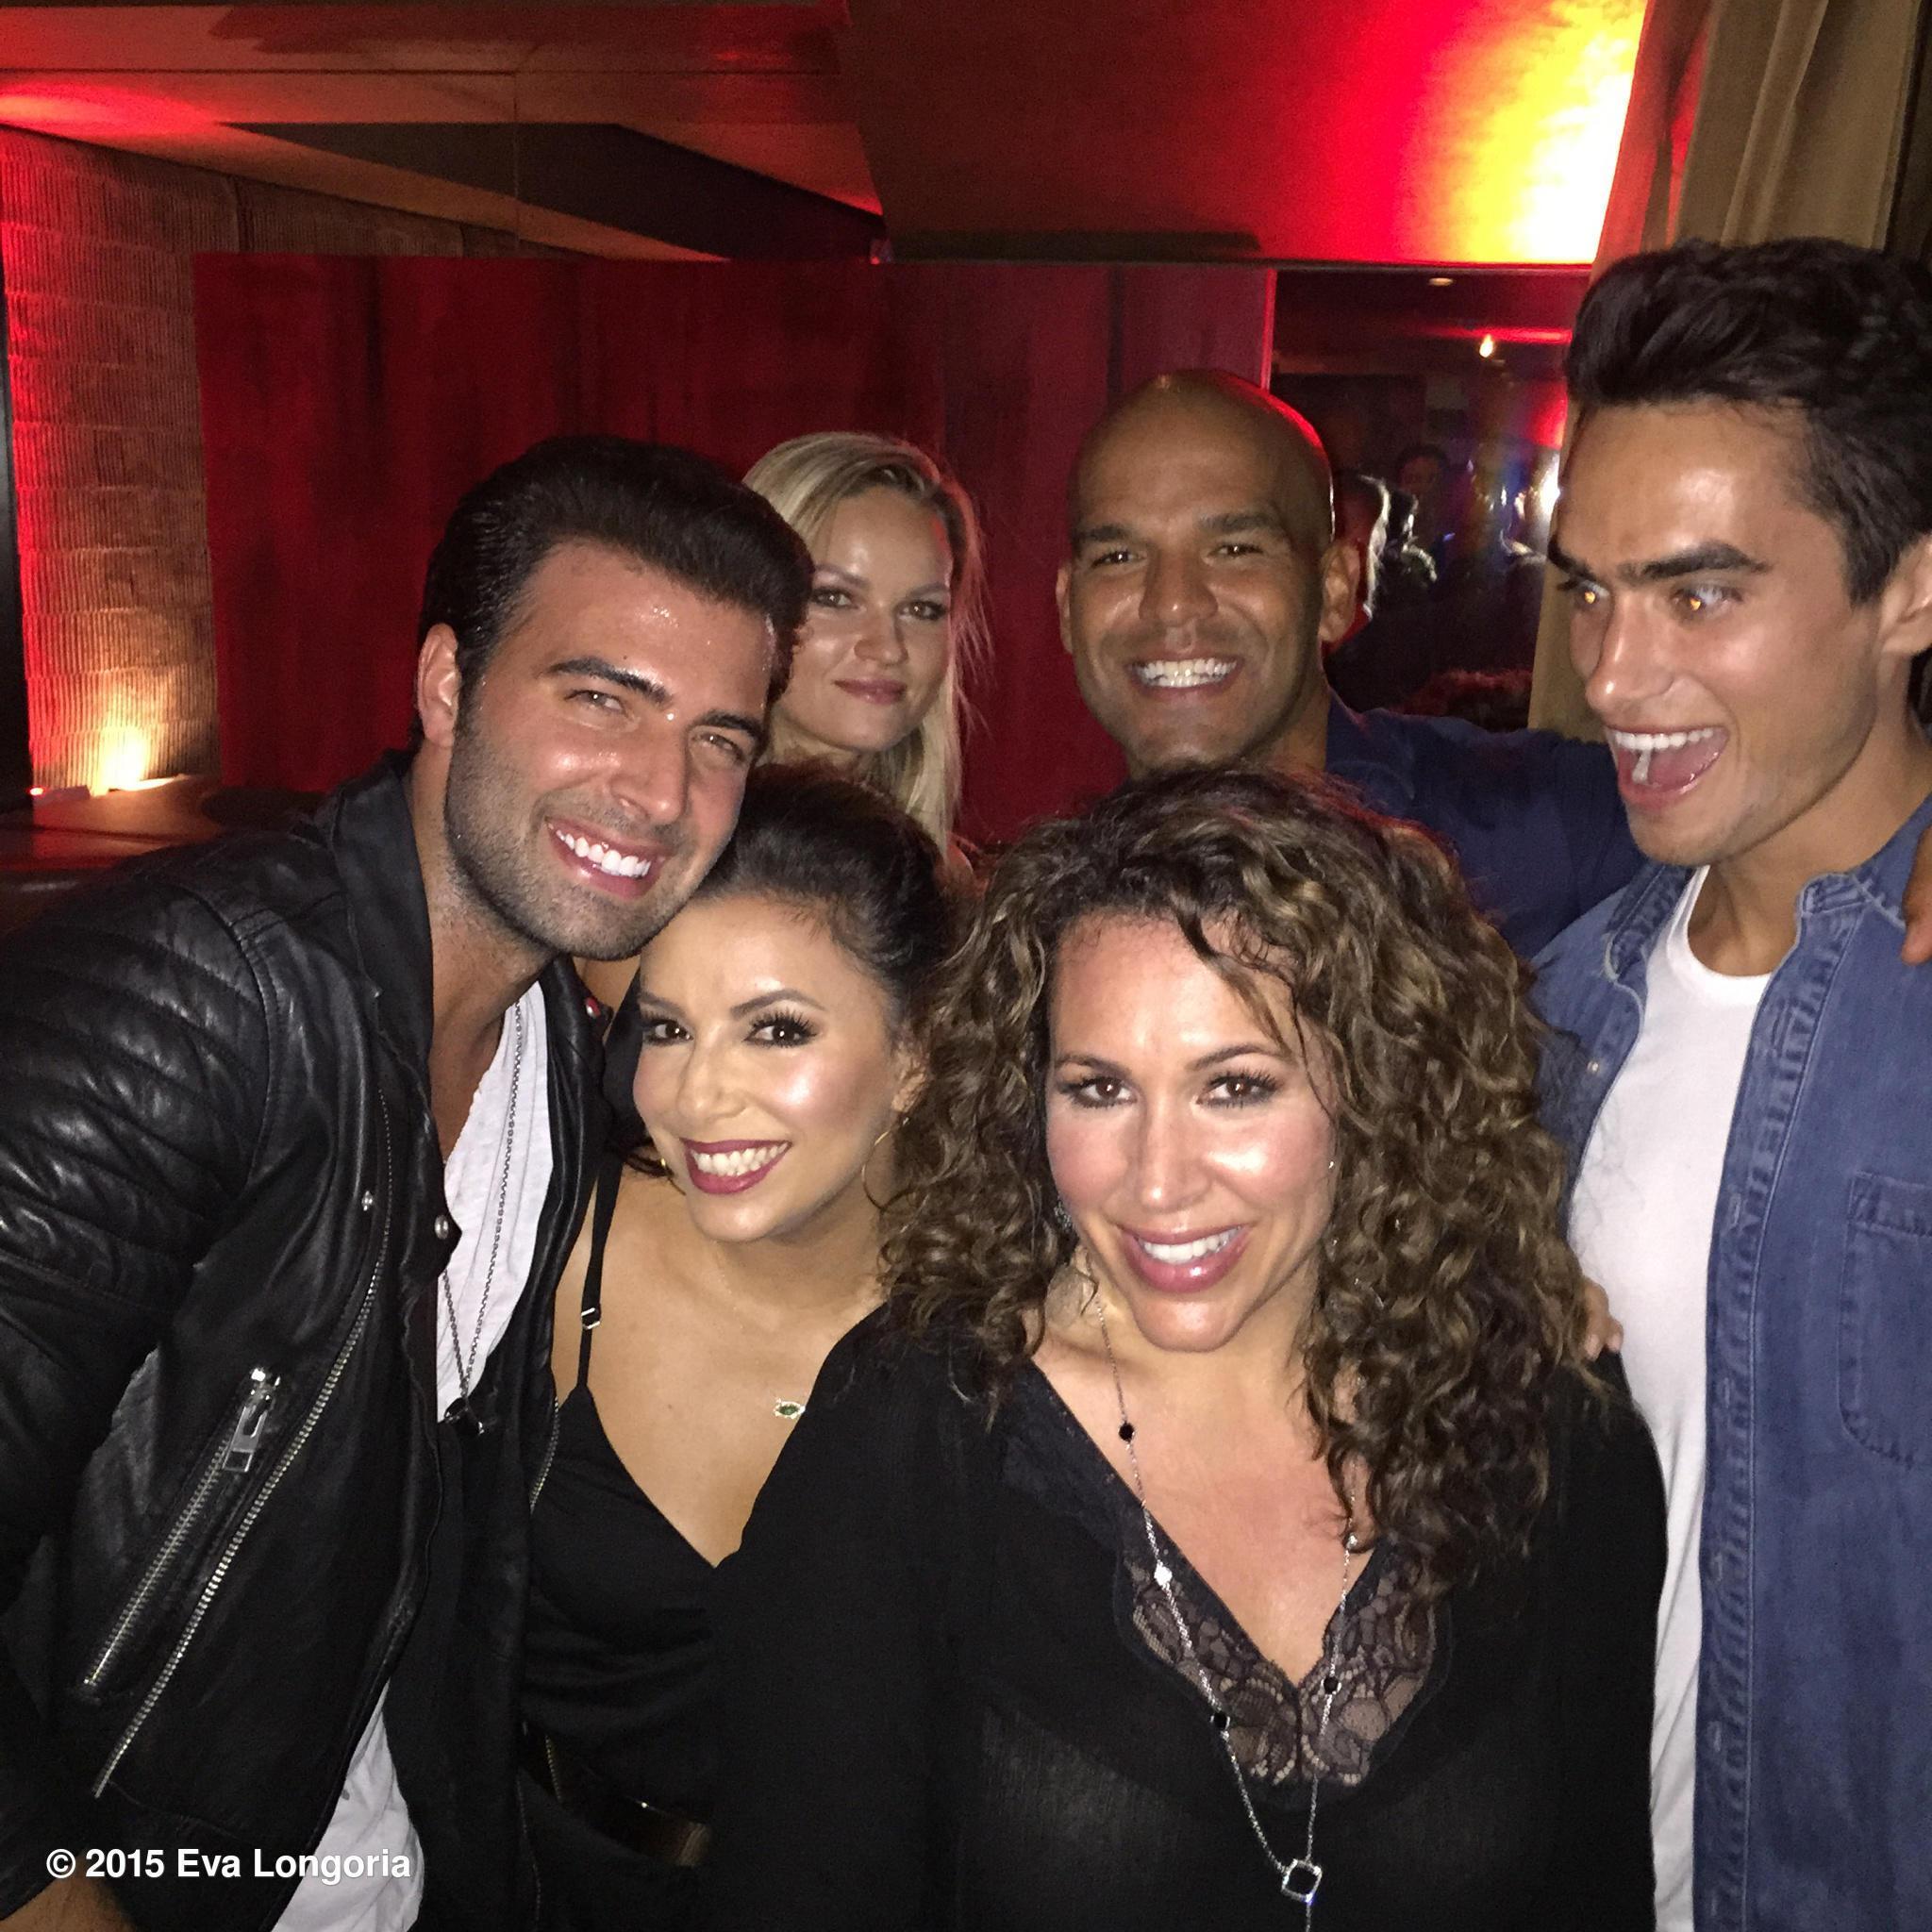 So much fun last night @BesoHollywood for #FiestaNights @jencarlosmusic @josebrooks @DianaMariaRiva @amaurynolasco http://t.co/YolE1PFPYv